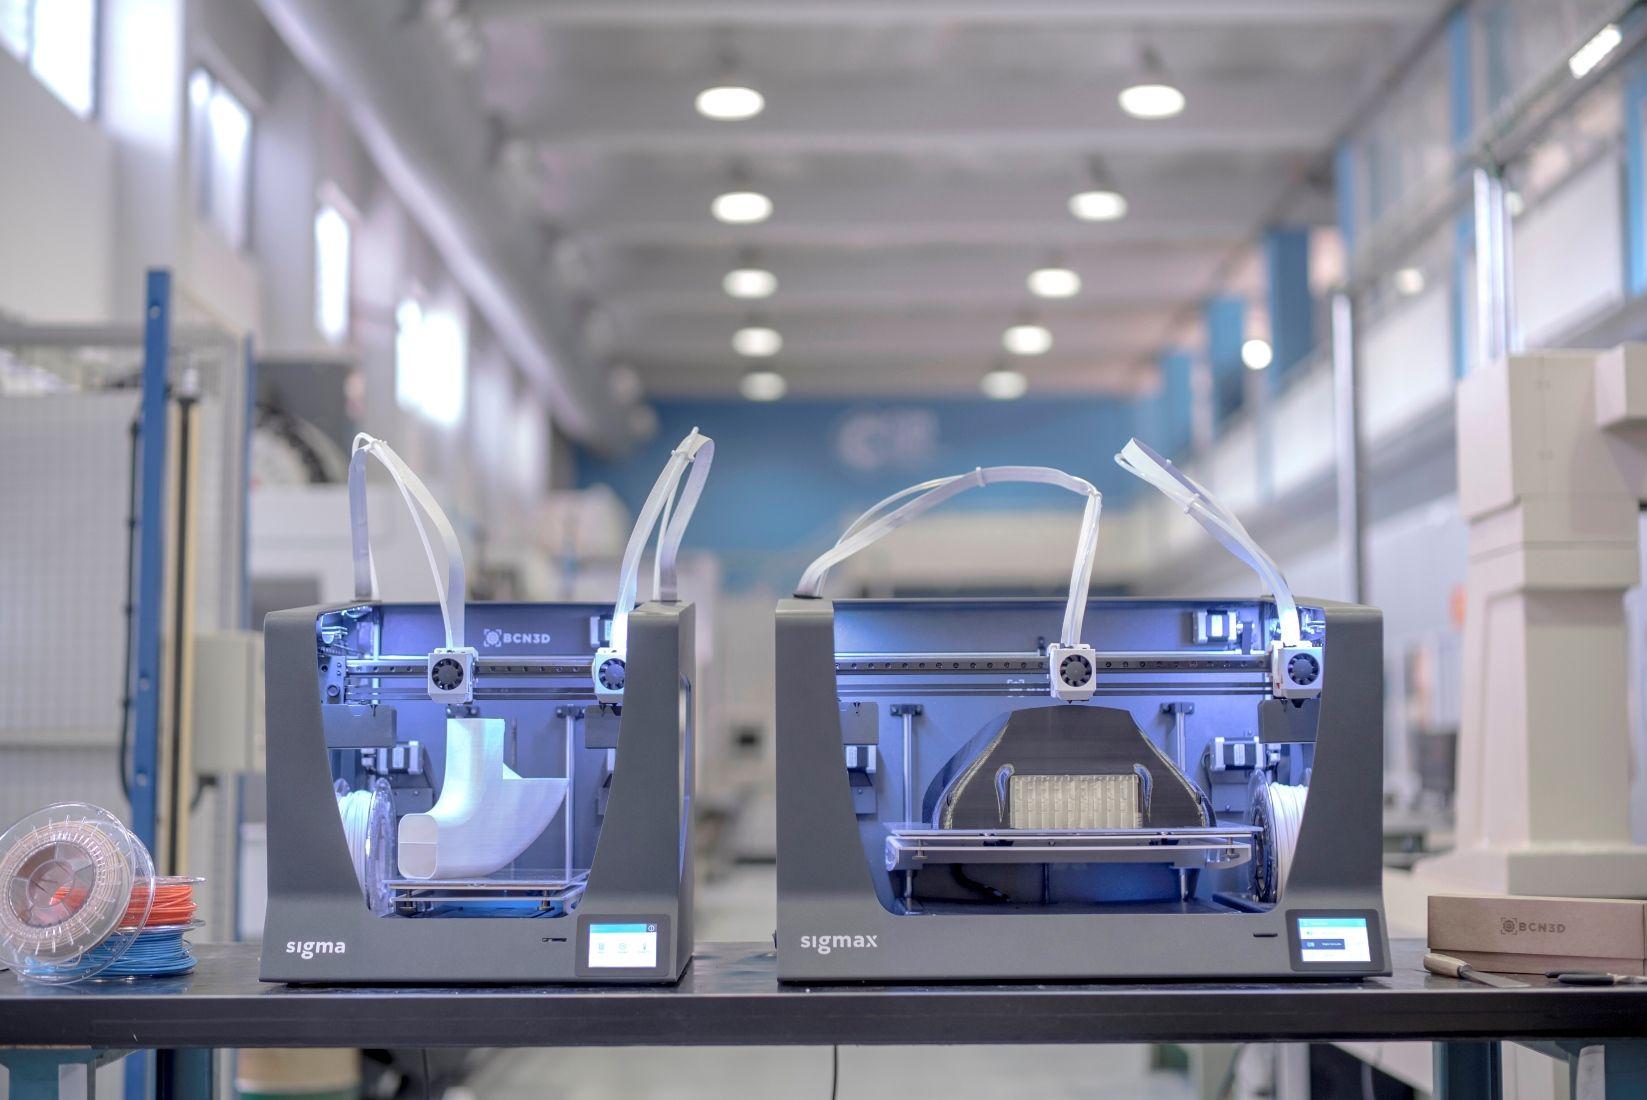 Foto de Impresoras 3D Sigma y SigmaX de BCN3D